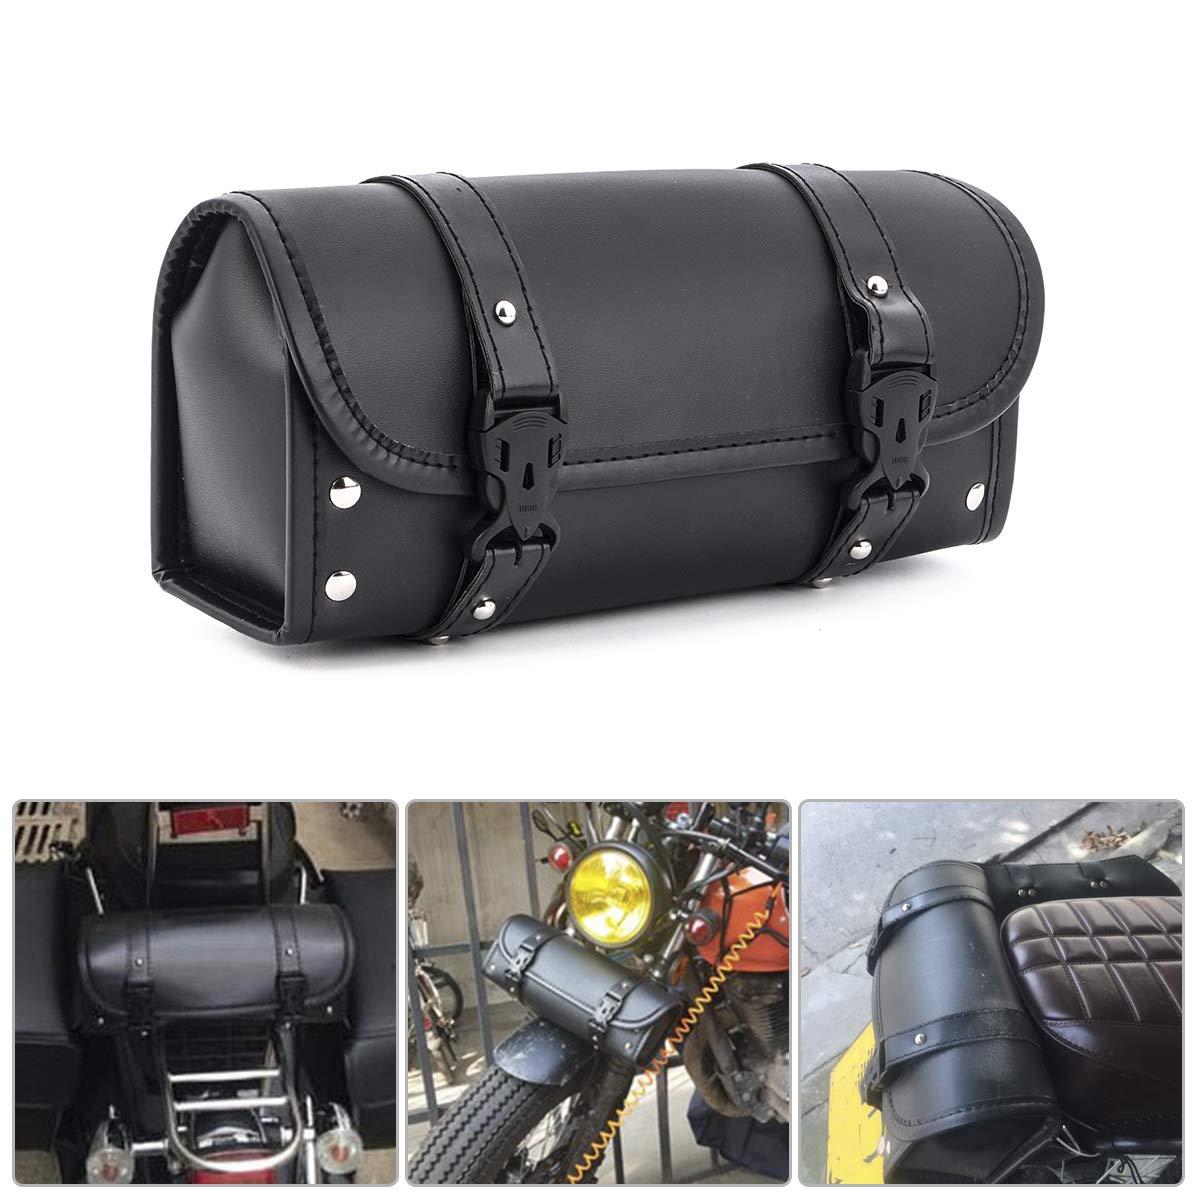 NBOMOTO Motorcycle Tool Bag Saddlebags PU Leather Storage Tool Pouch Black